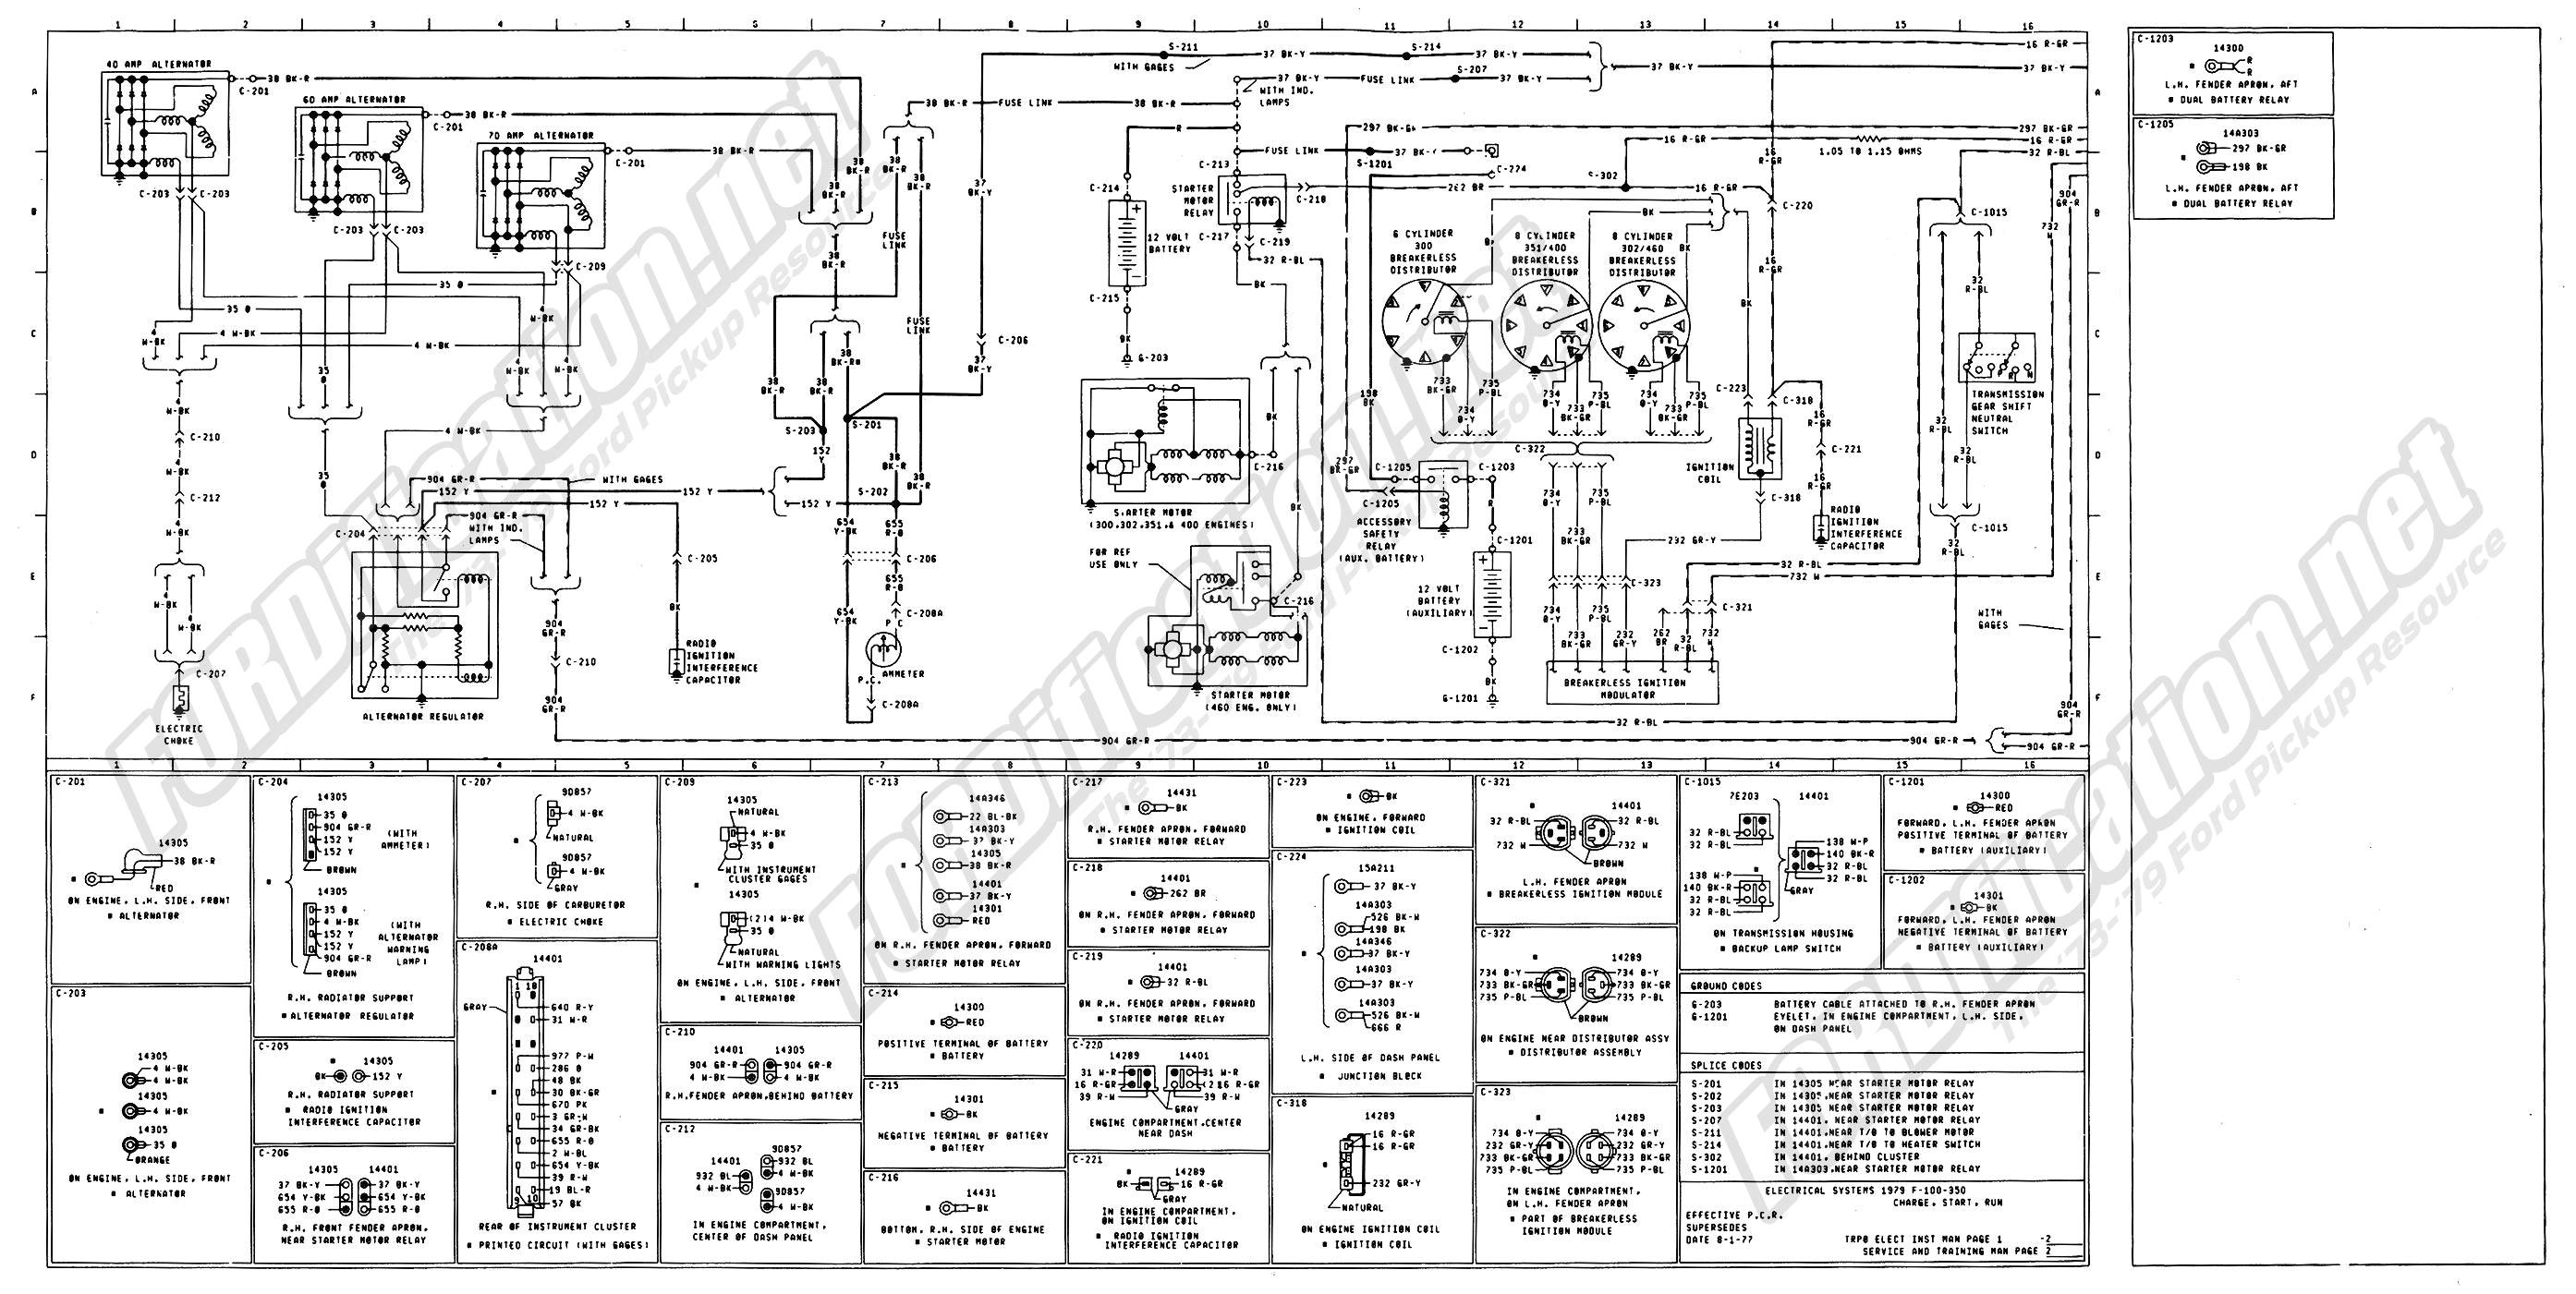 22r alternator wiring diagram best of 1999 ford explorer wiring diagram 2018 1991 e4od od button